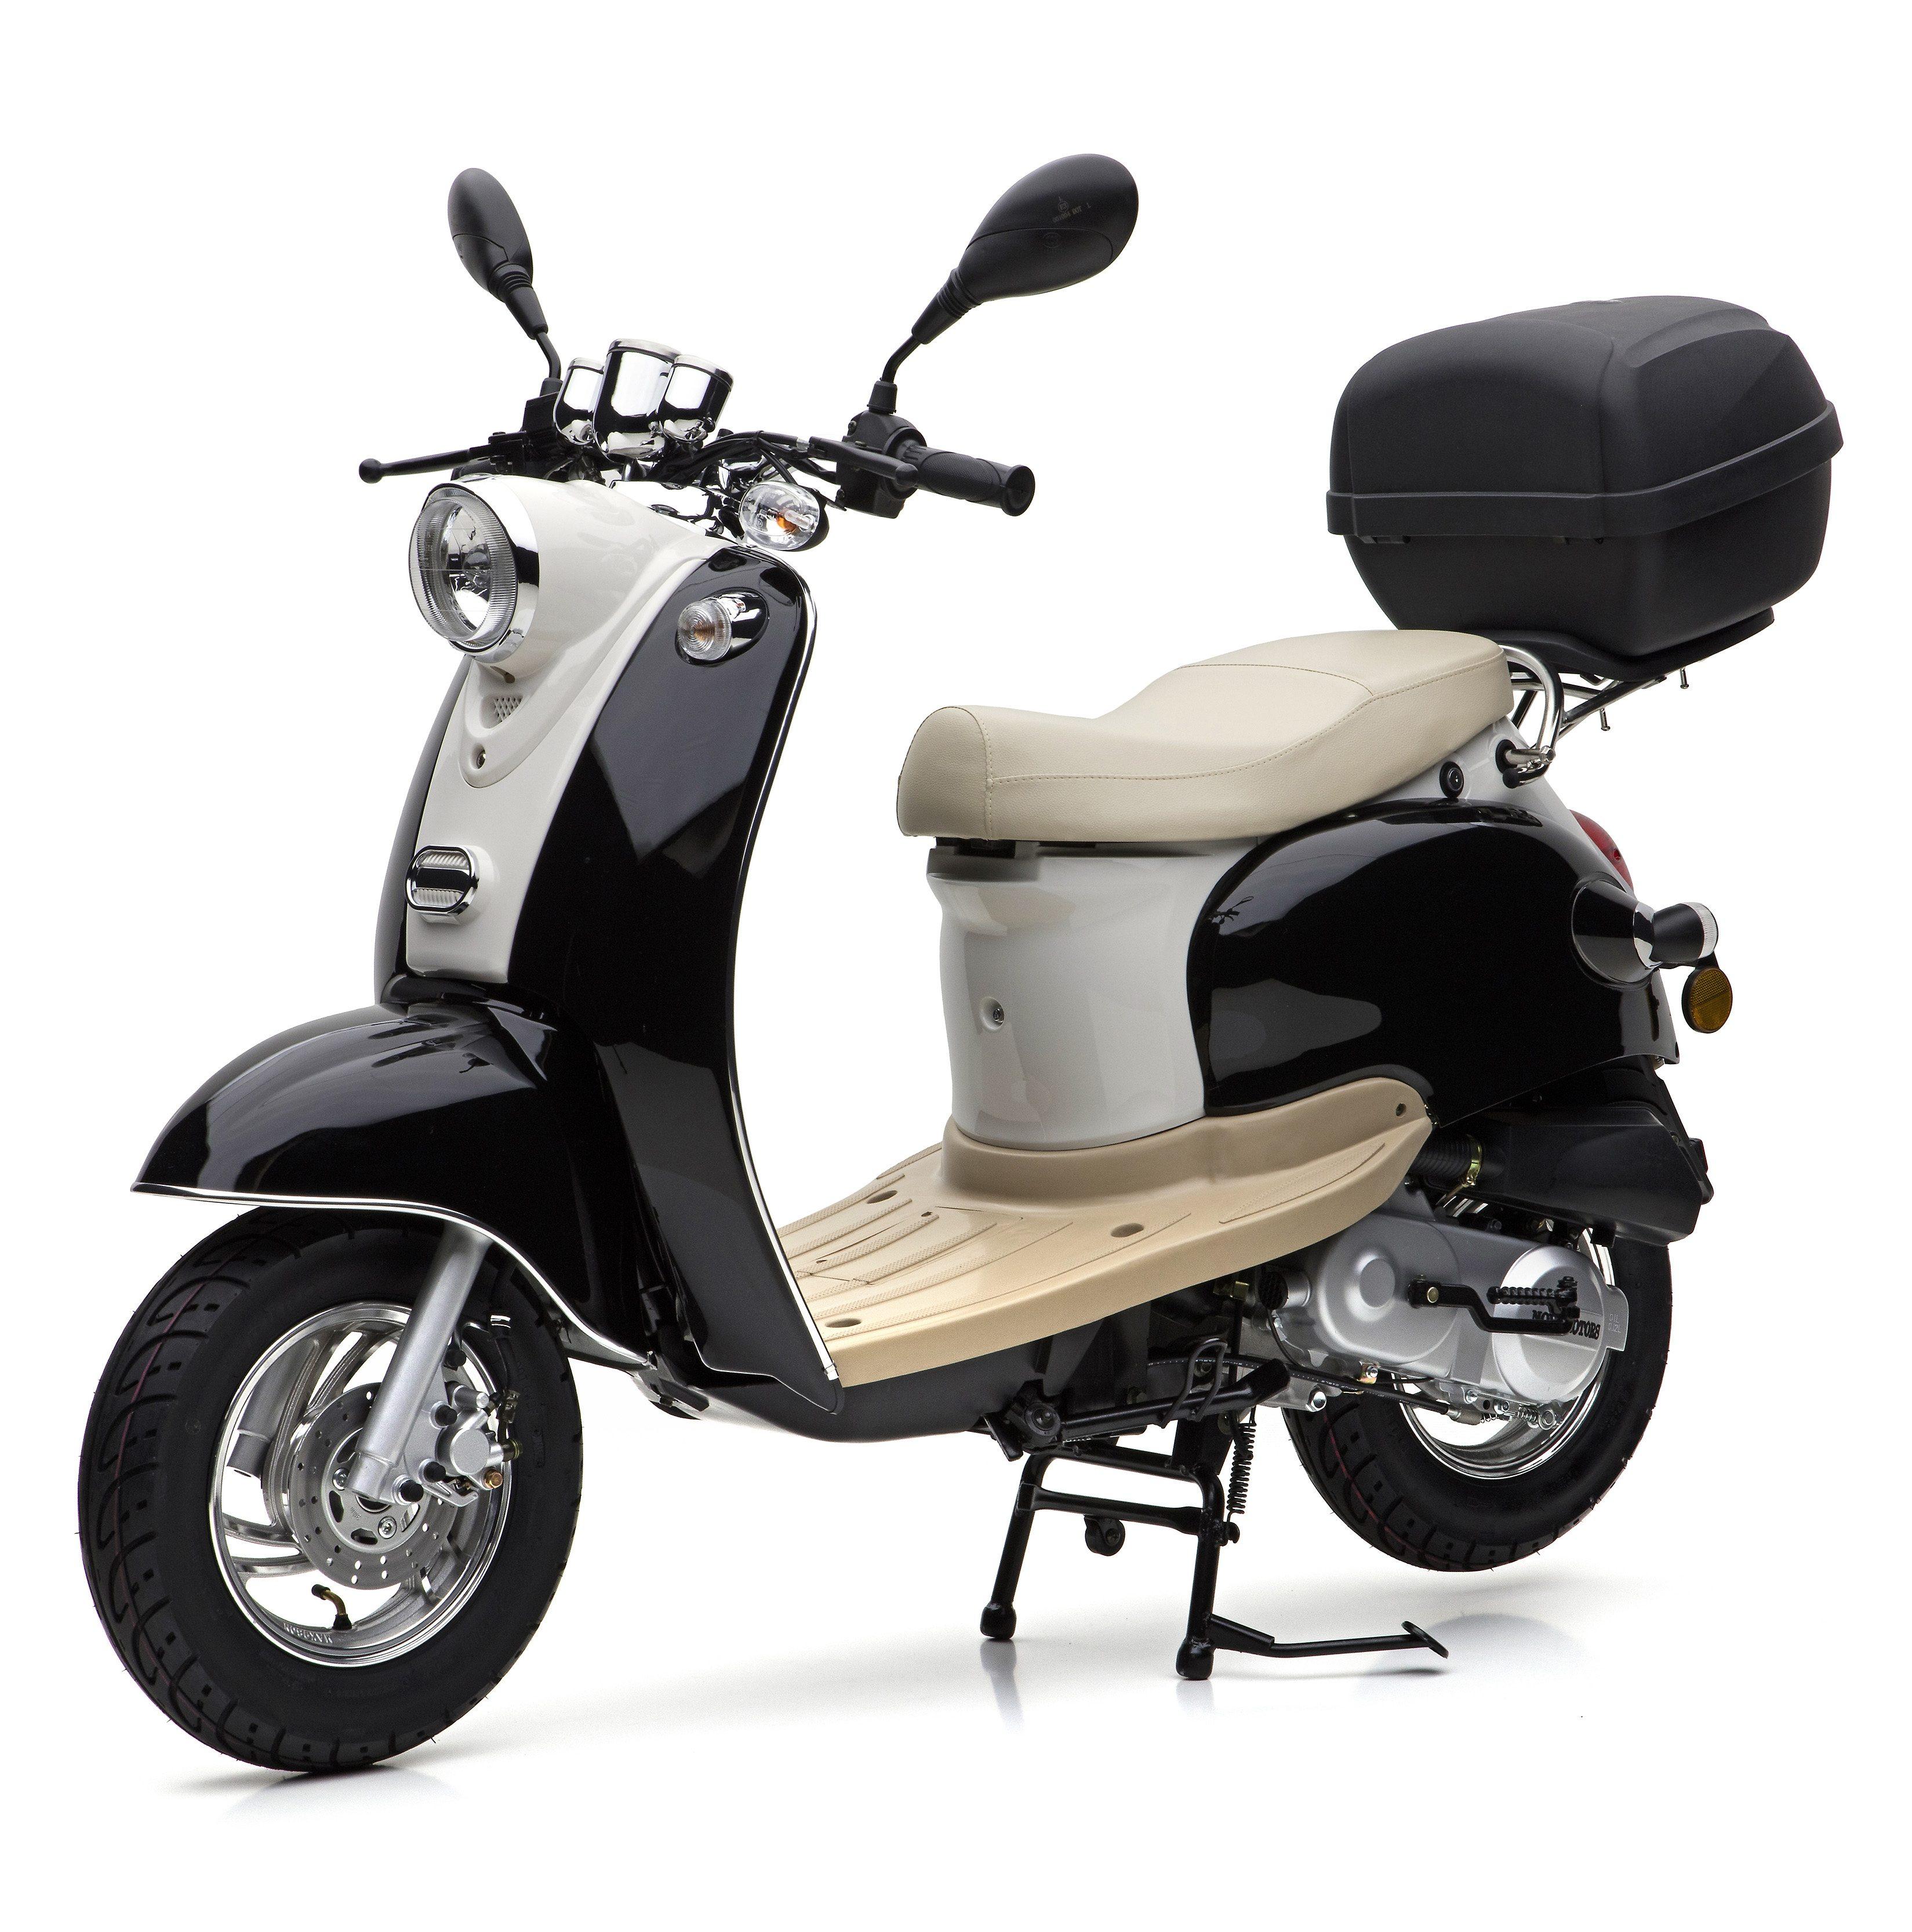 Nova Motors Motorroller inkl. Topcase, 49 ccm, 45 km/h, schwarz weiß, »Venezia II«